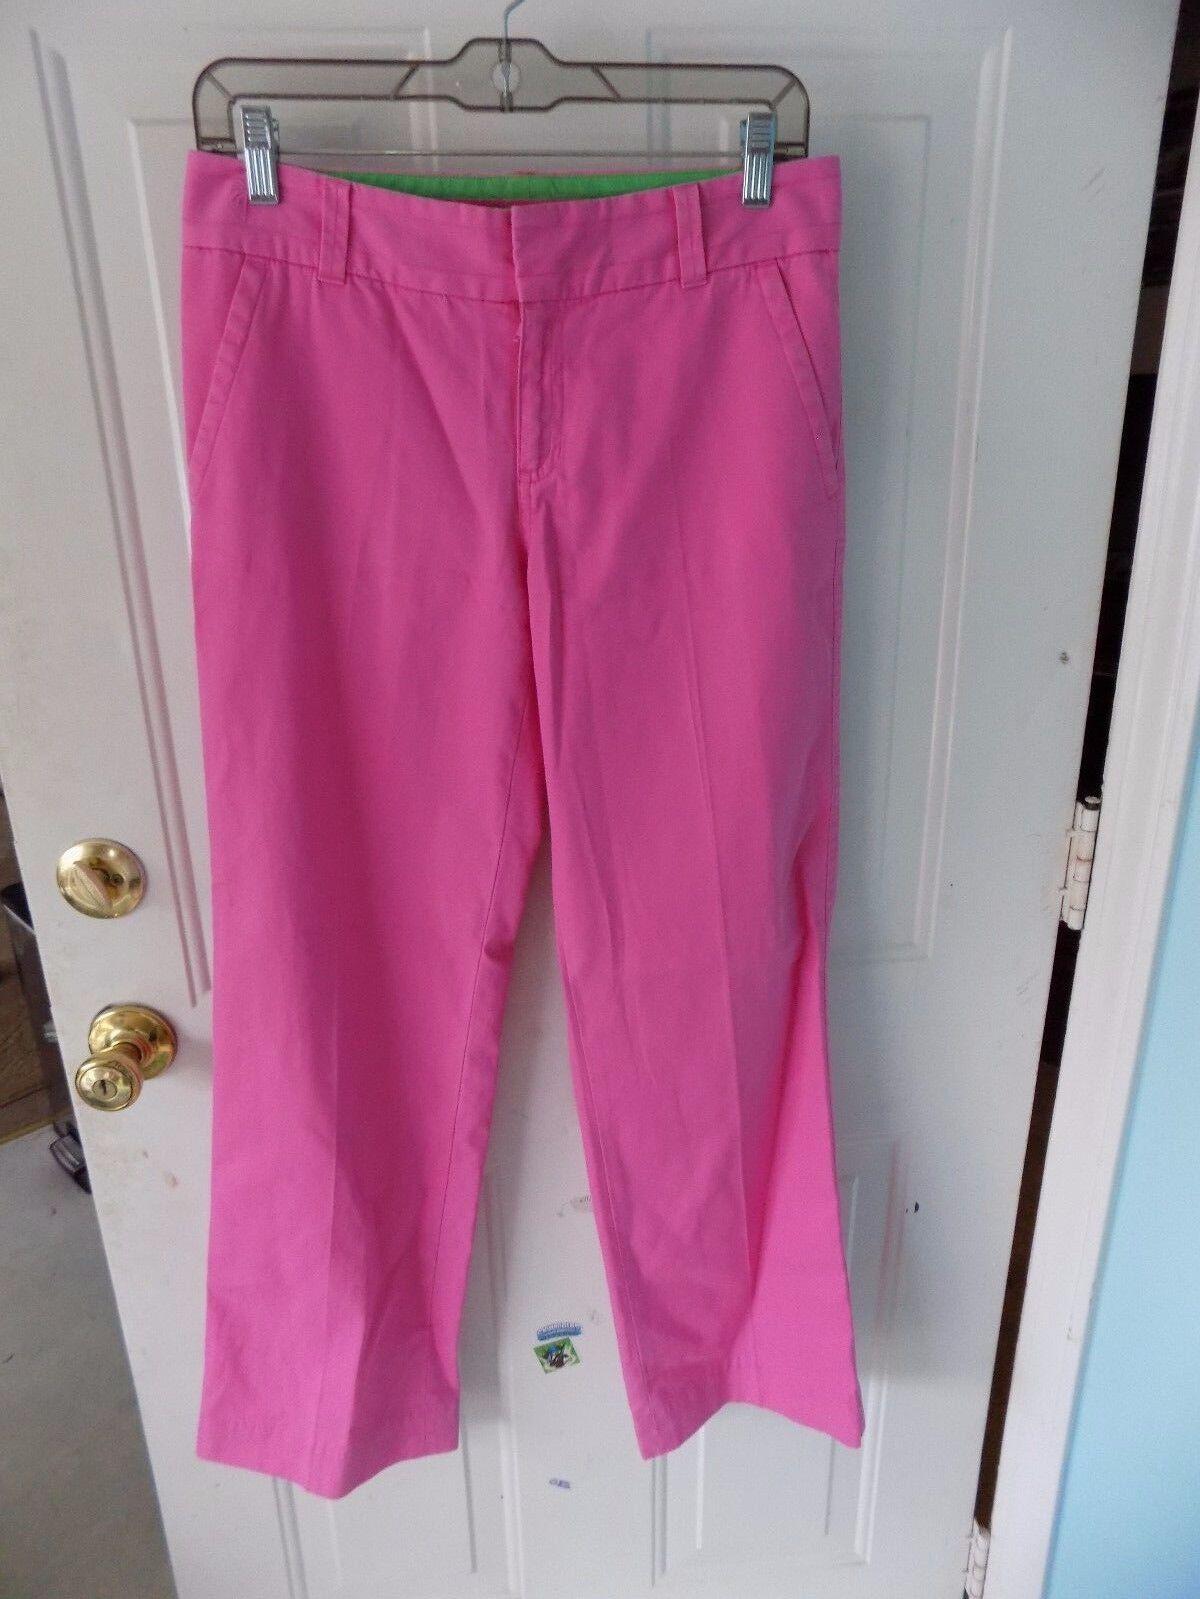 LILLY PULITZER Hot Pink Flat Front Cotton Dress Pants PALM BEACH SIZE 2 EUC